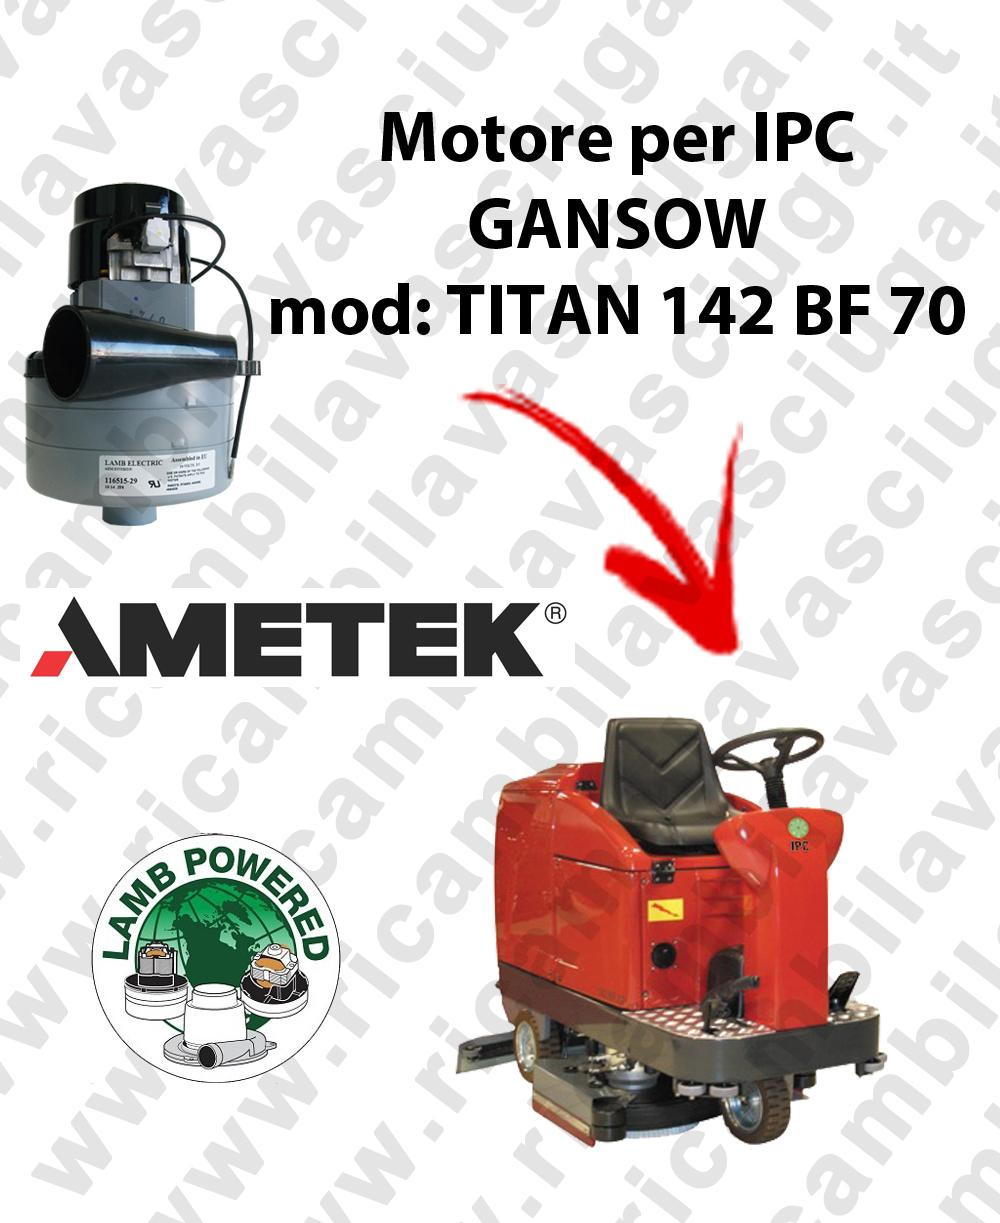 TITAN 142 BF 70 MOTORE LAMB AMETEK di aspirazione per lavapavimenti IPC GANSOW